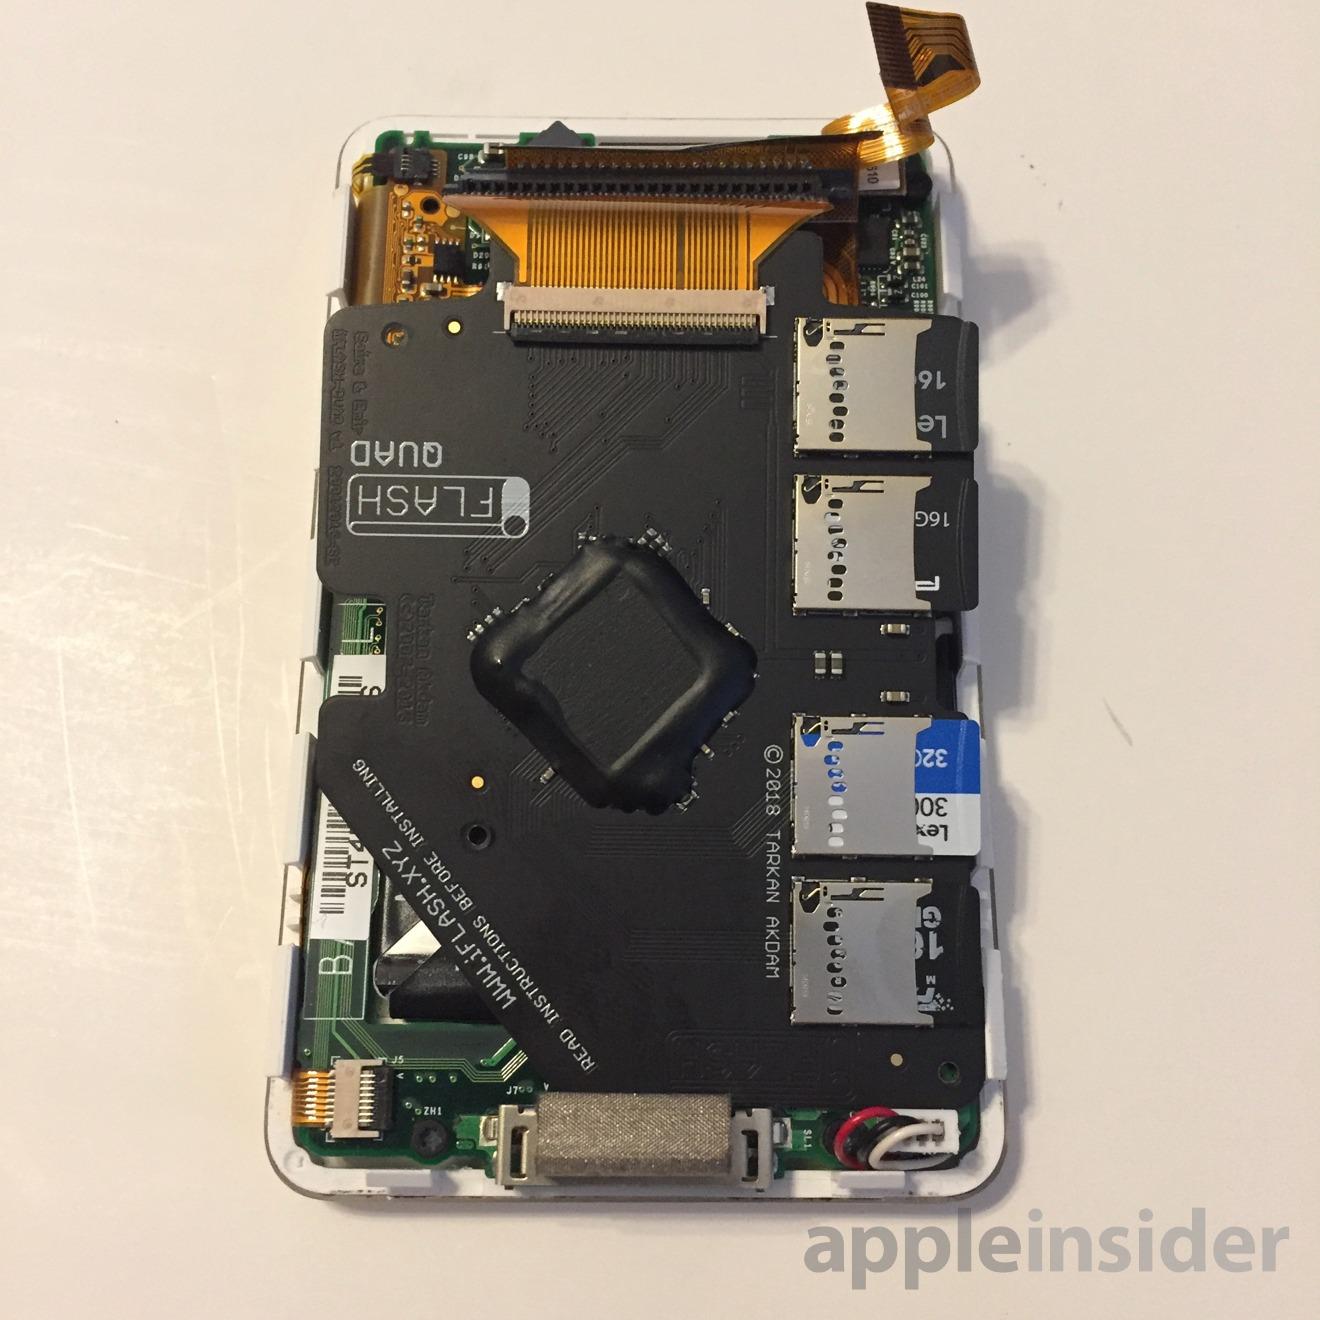 Internal hardware of Apple iPod Classic